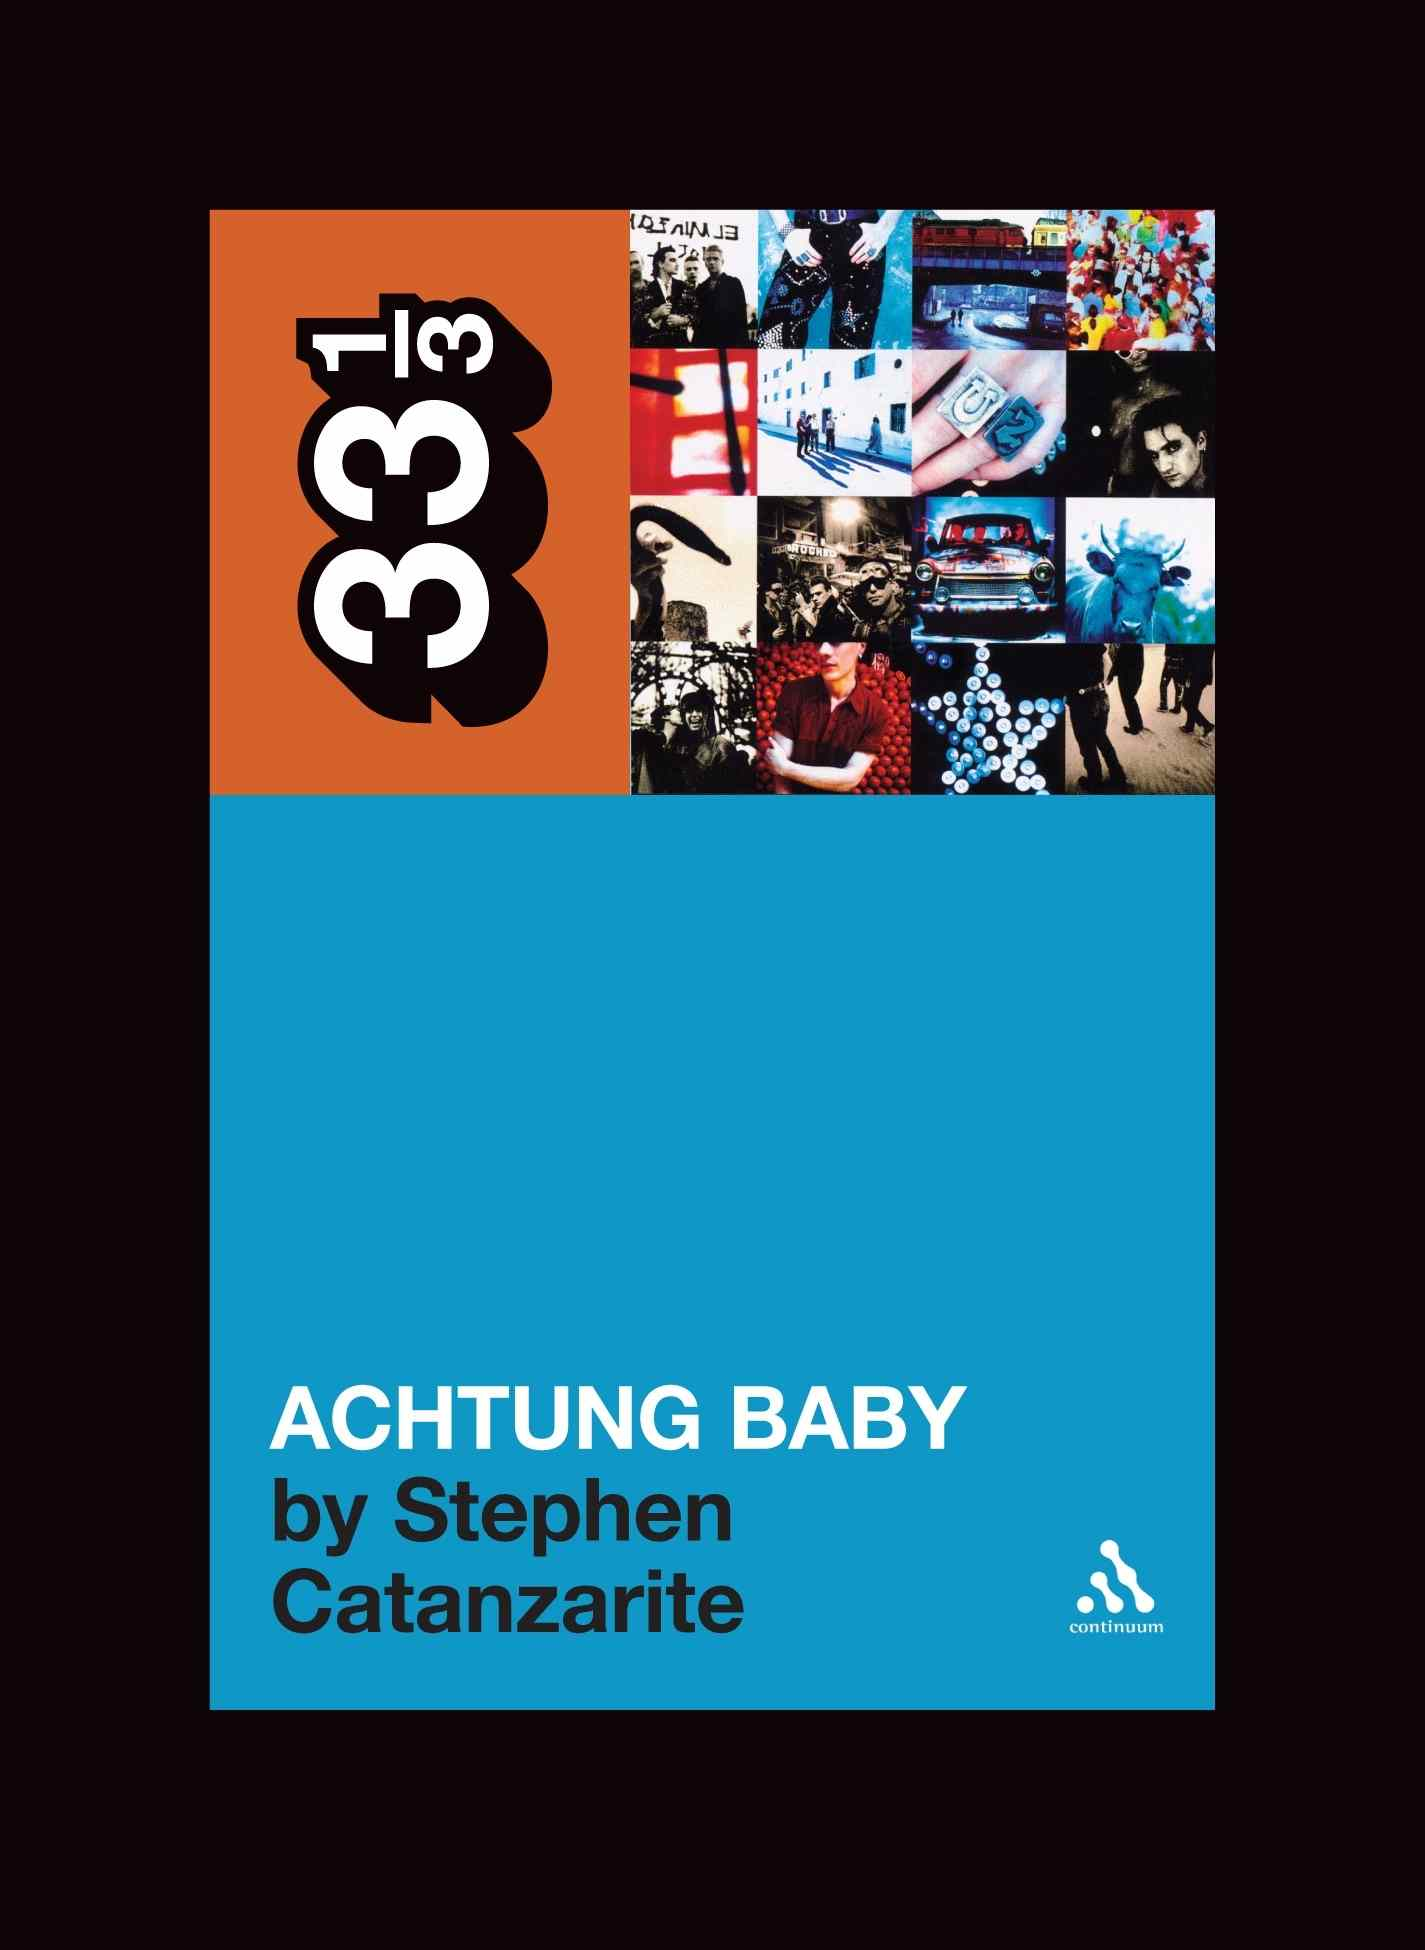 U2's Achtung Baby